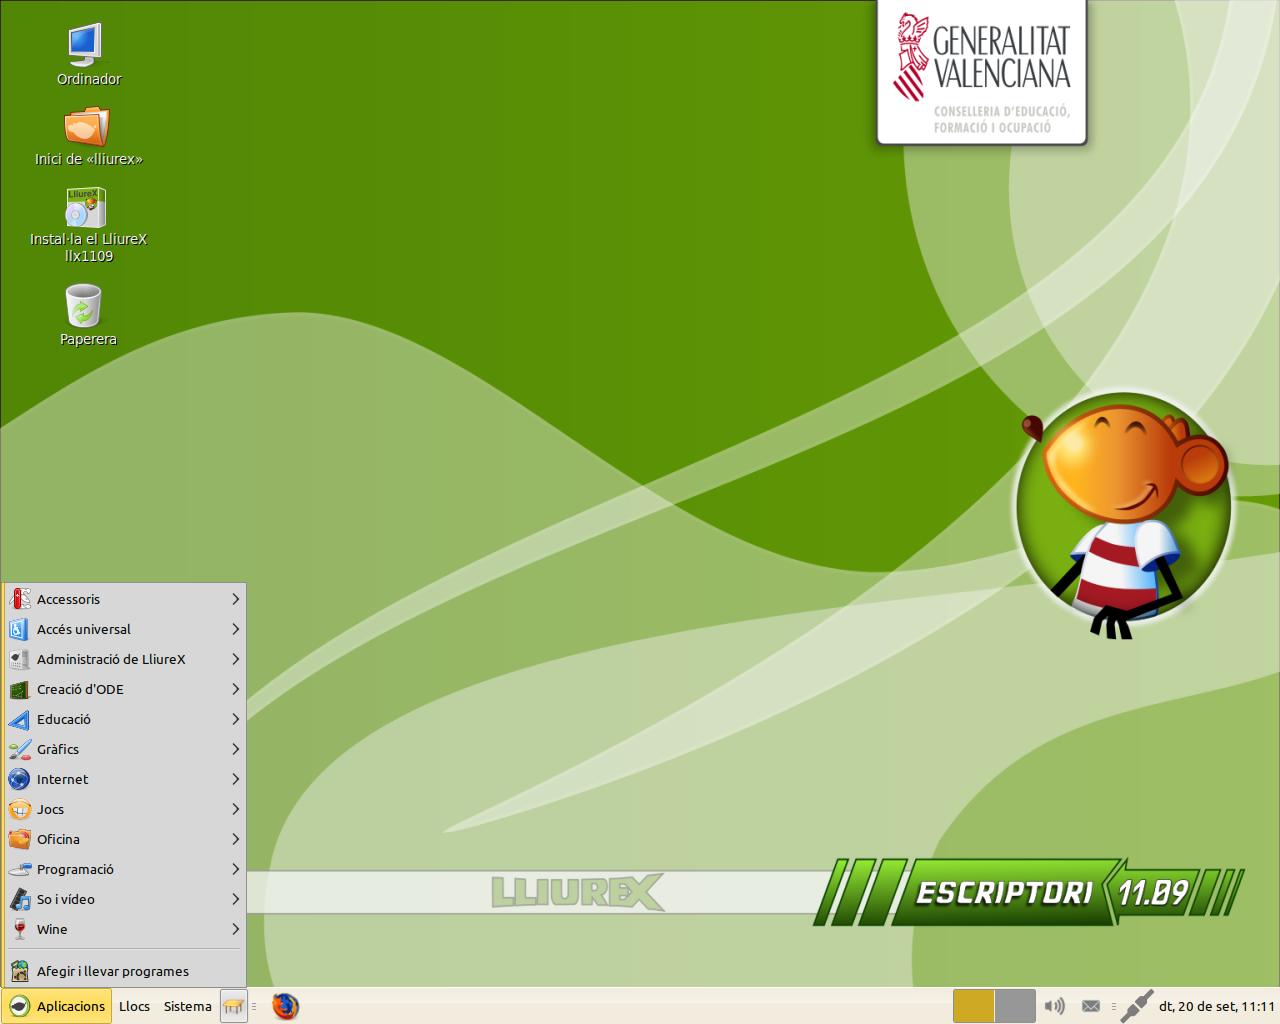 Imagen tomada de: http://www.bilib.es/recursos/catalogo-de-aplicaciones/ficha-de-aplicacion/app/lliurex/